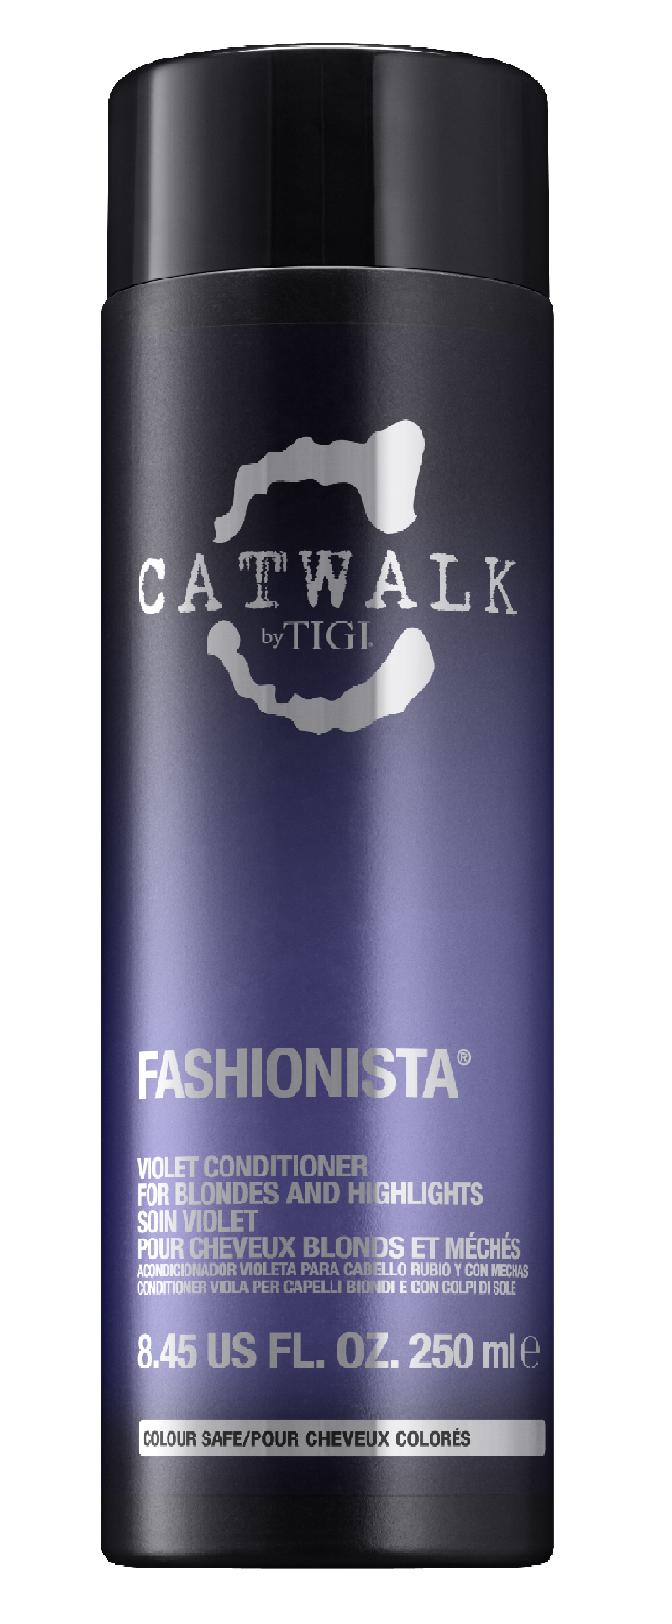 TIGI Catwalk Fashionista Violet Conditioner 250ml